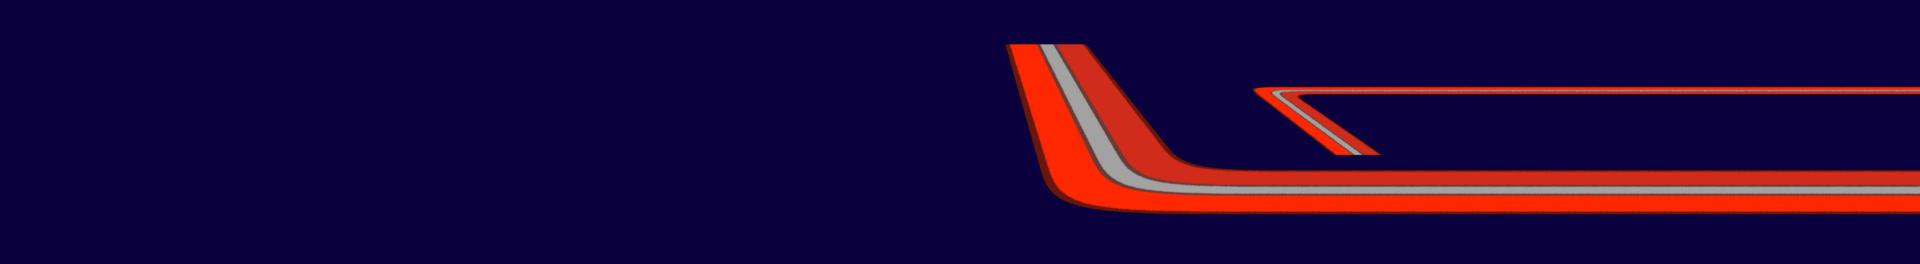 striperSideV2 full Stock Video Footage